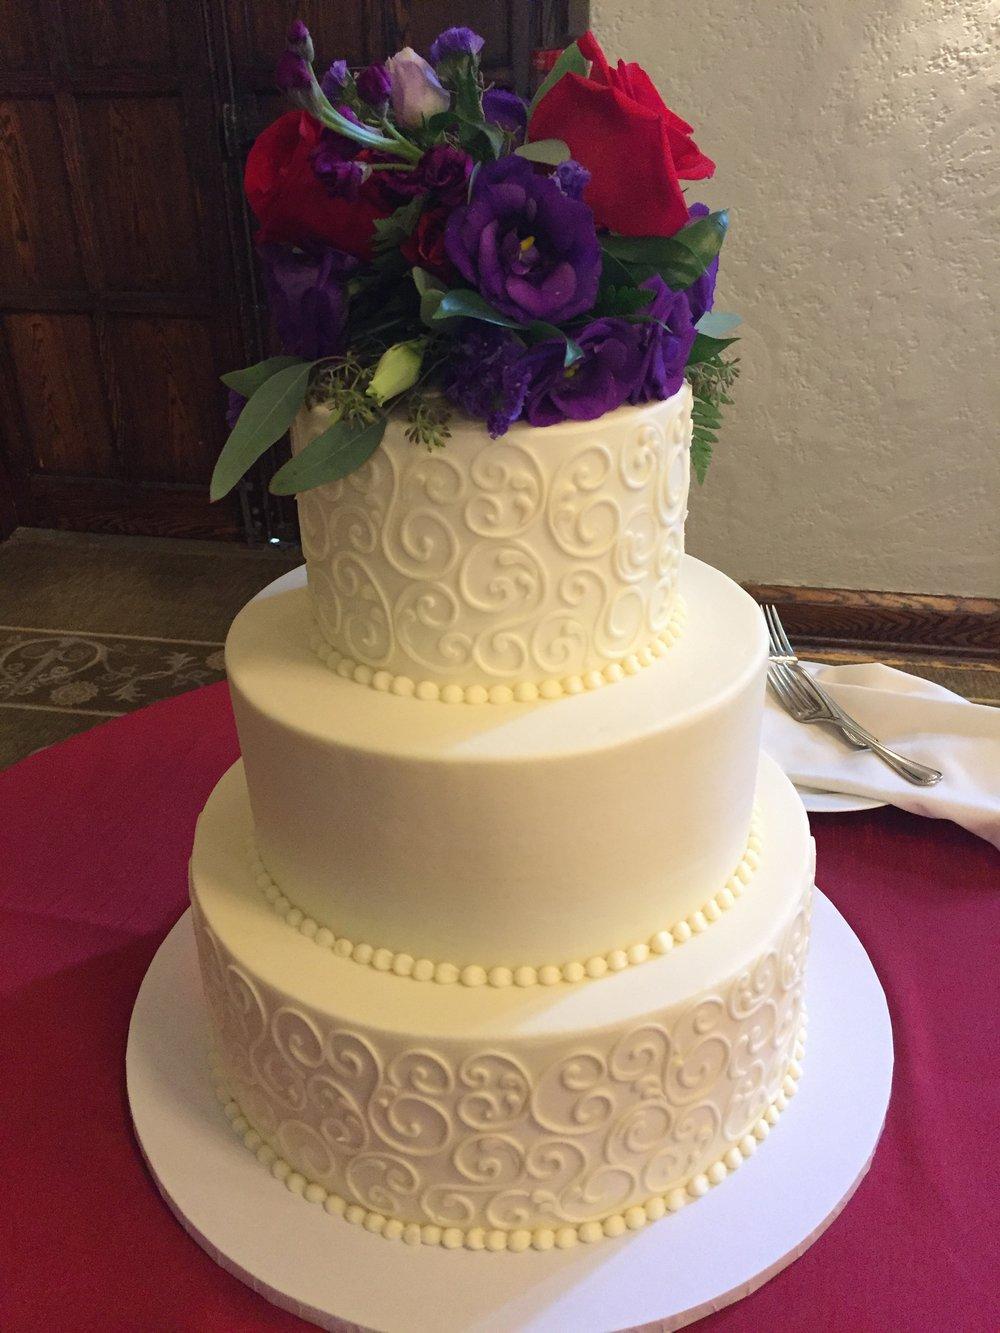 Jewel Tone Flowers for a Wedding